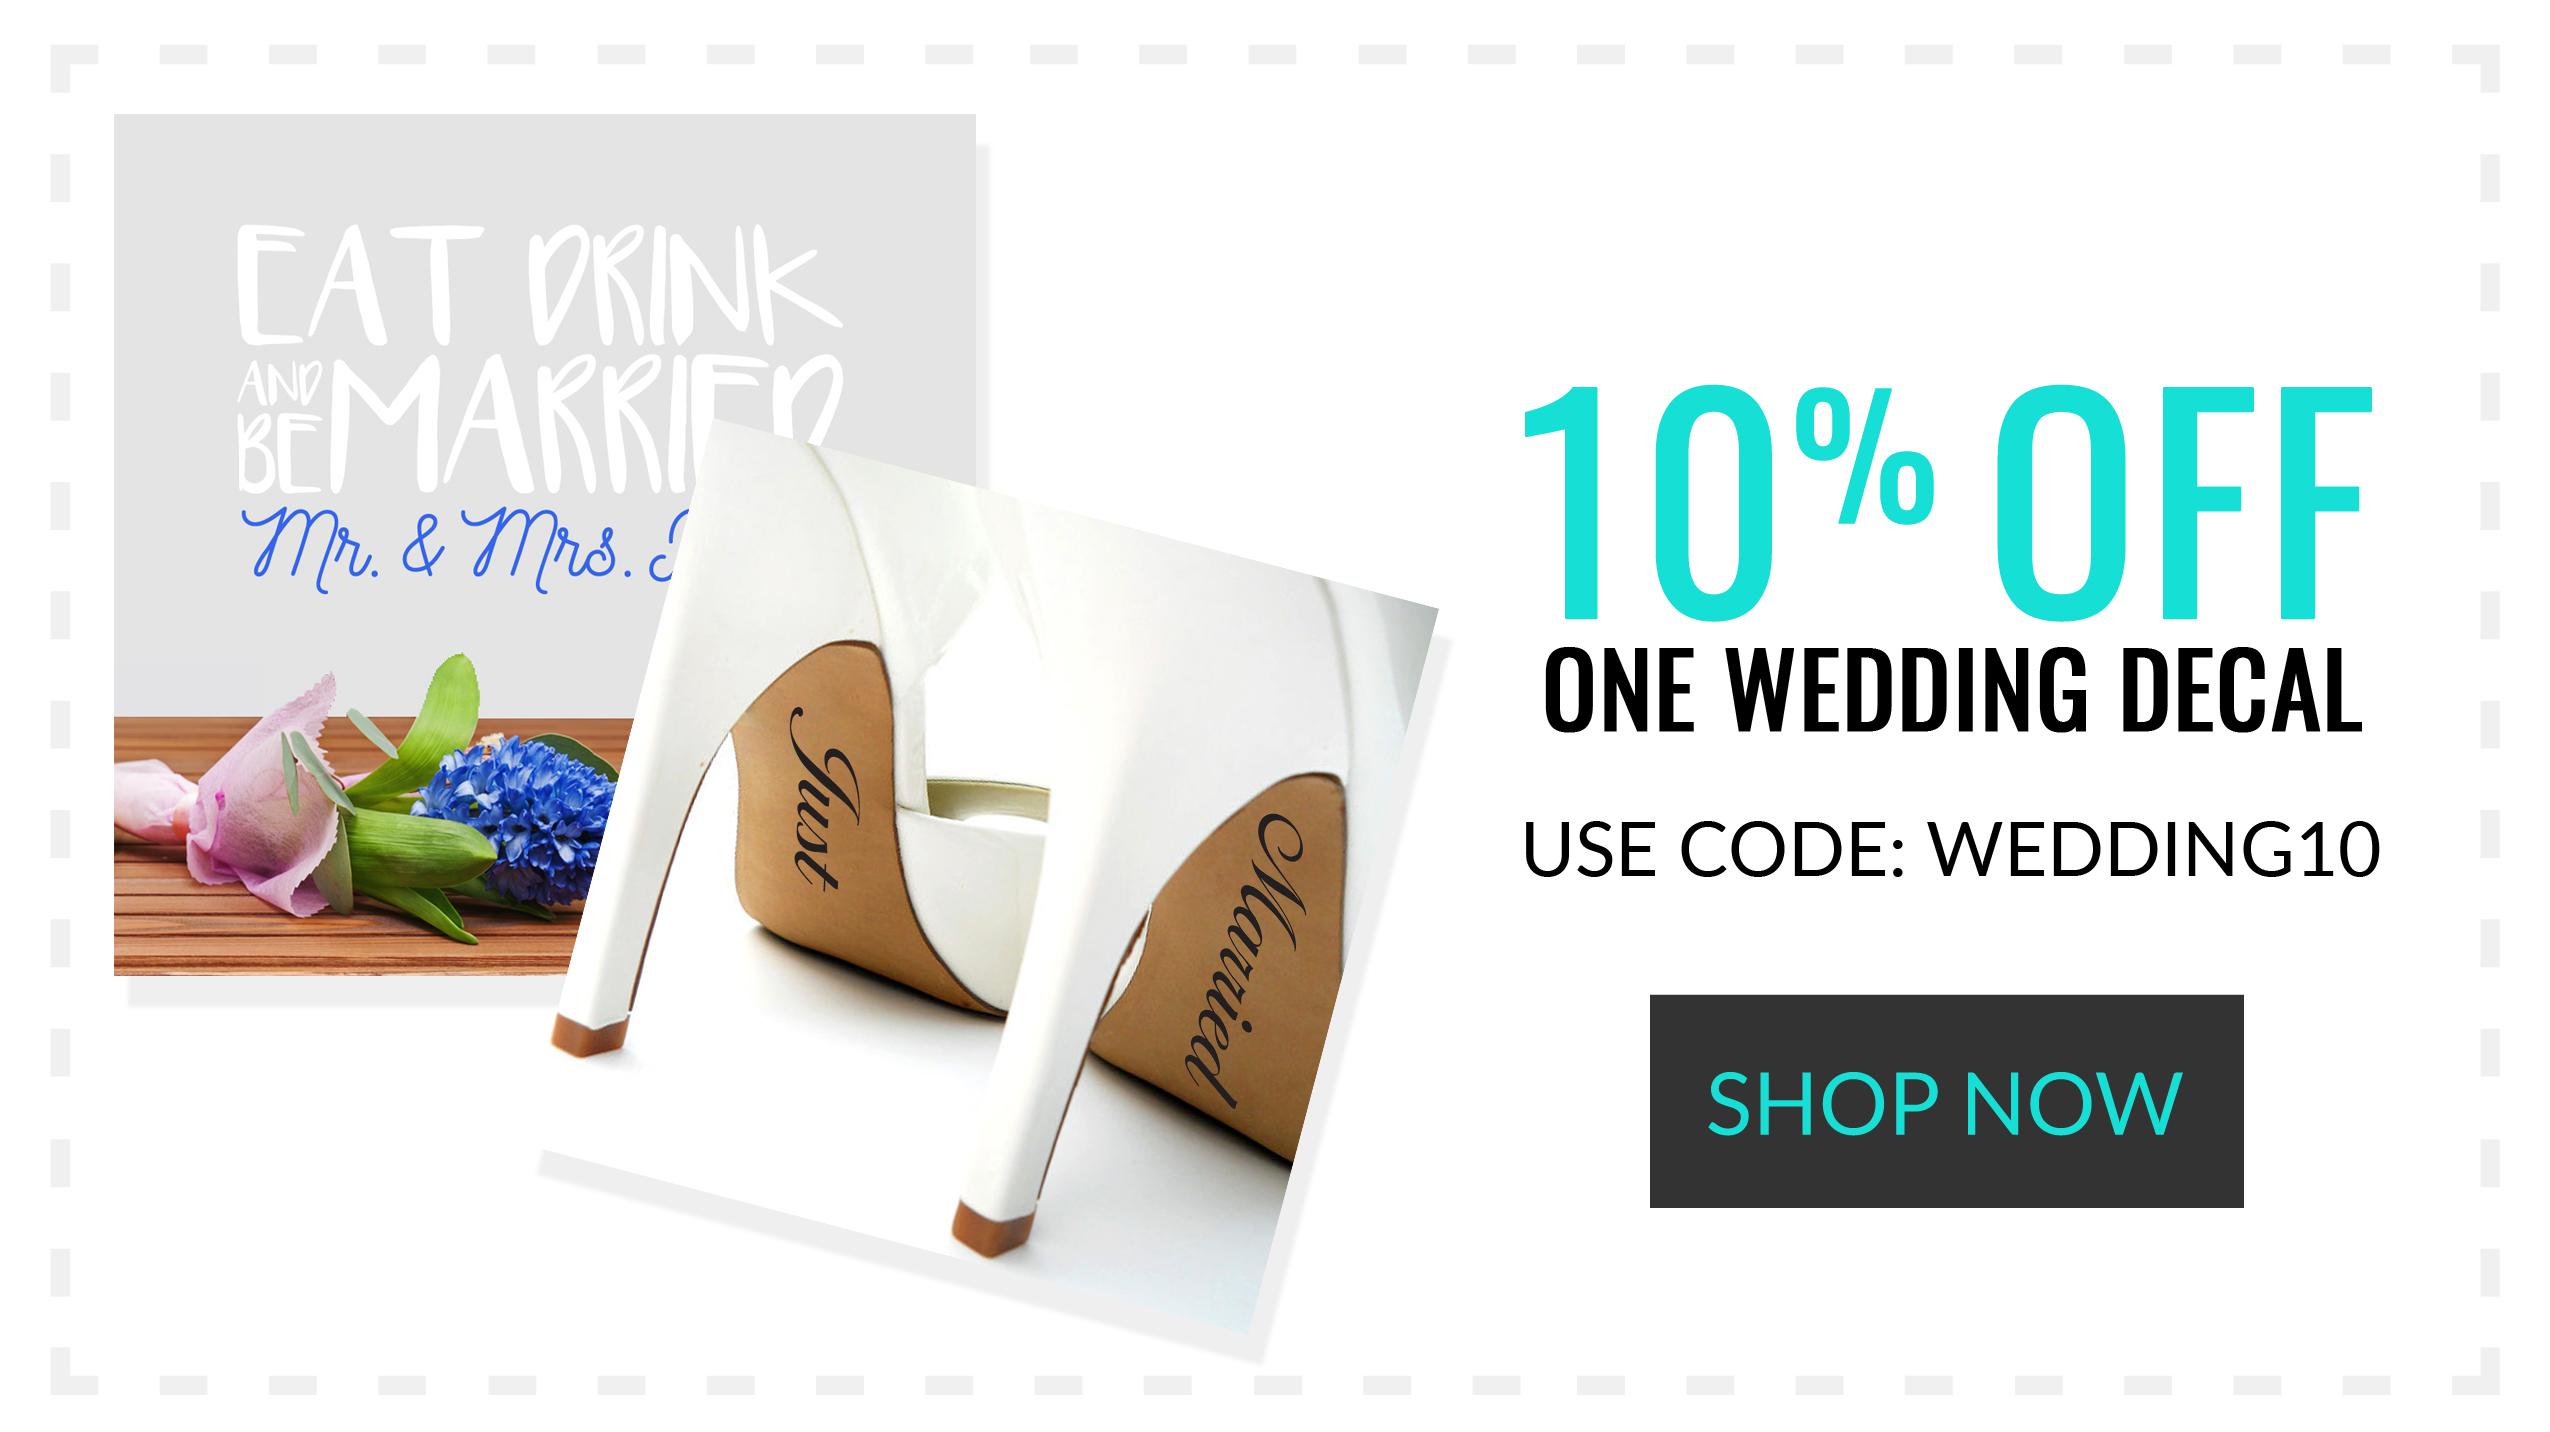 dealwedding10.jpg